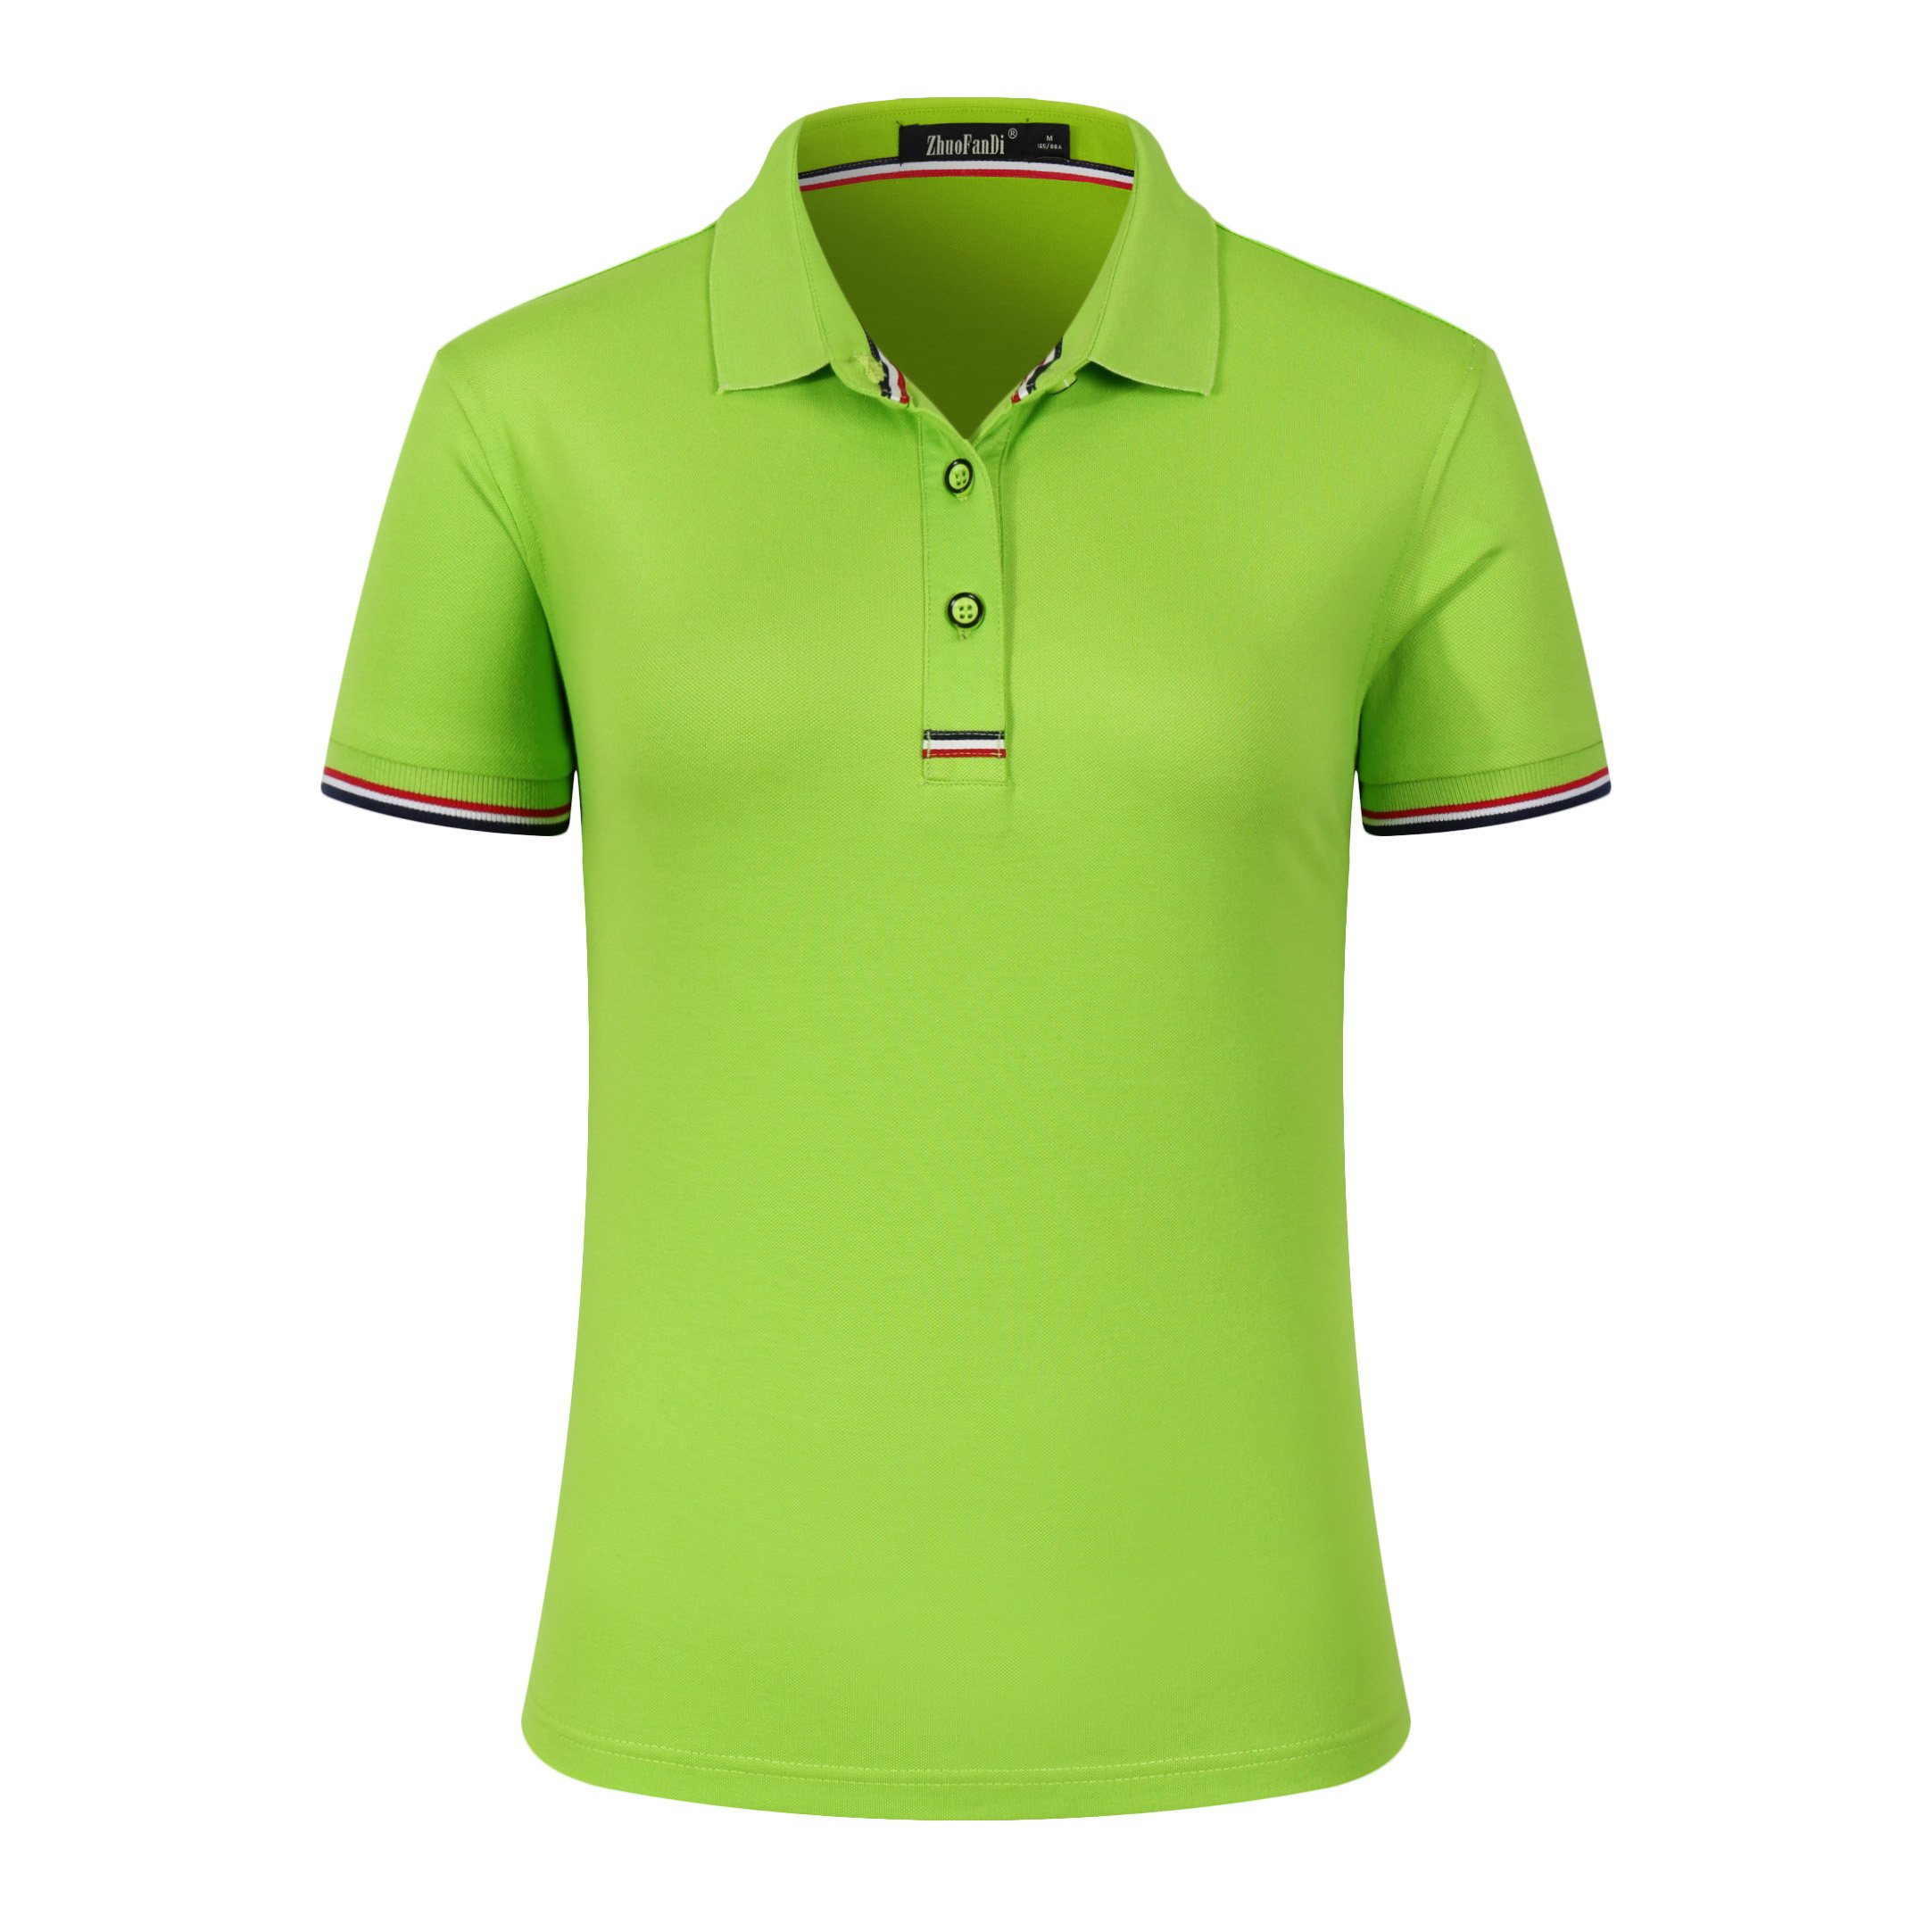 Mitario Femiego Women Classic Striped Collar Slim Fit Golf Polo Shirt Fluorescent Green S